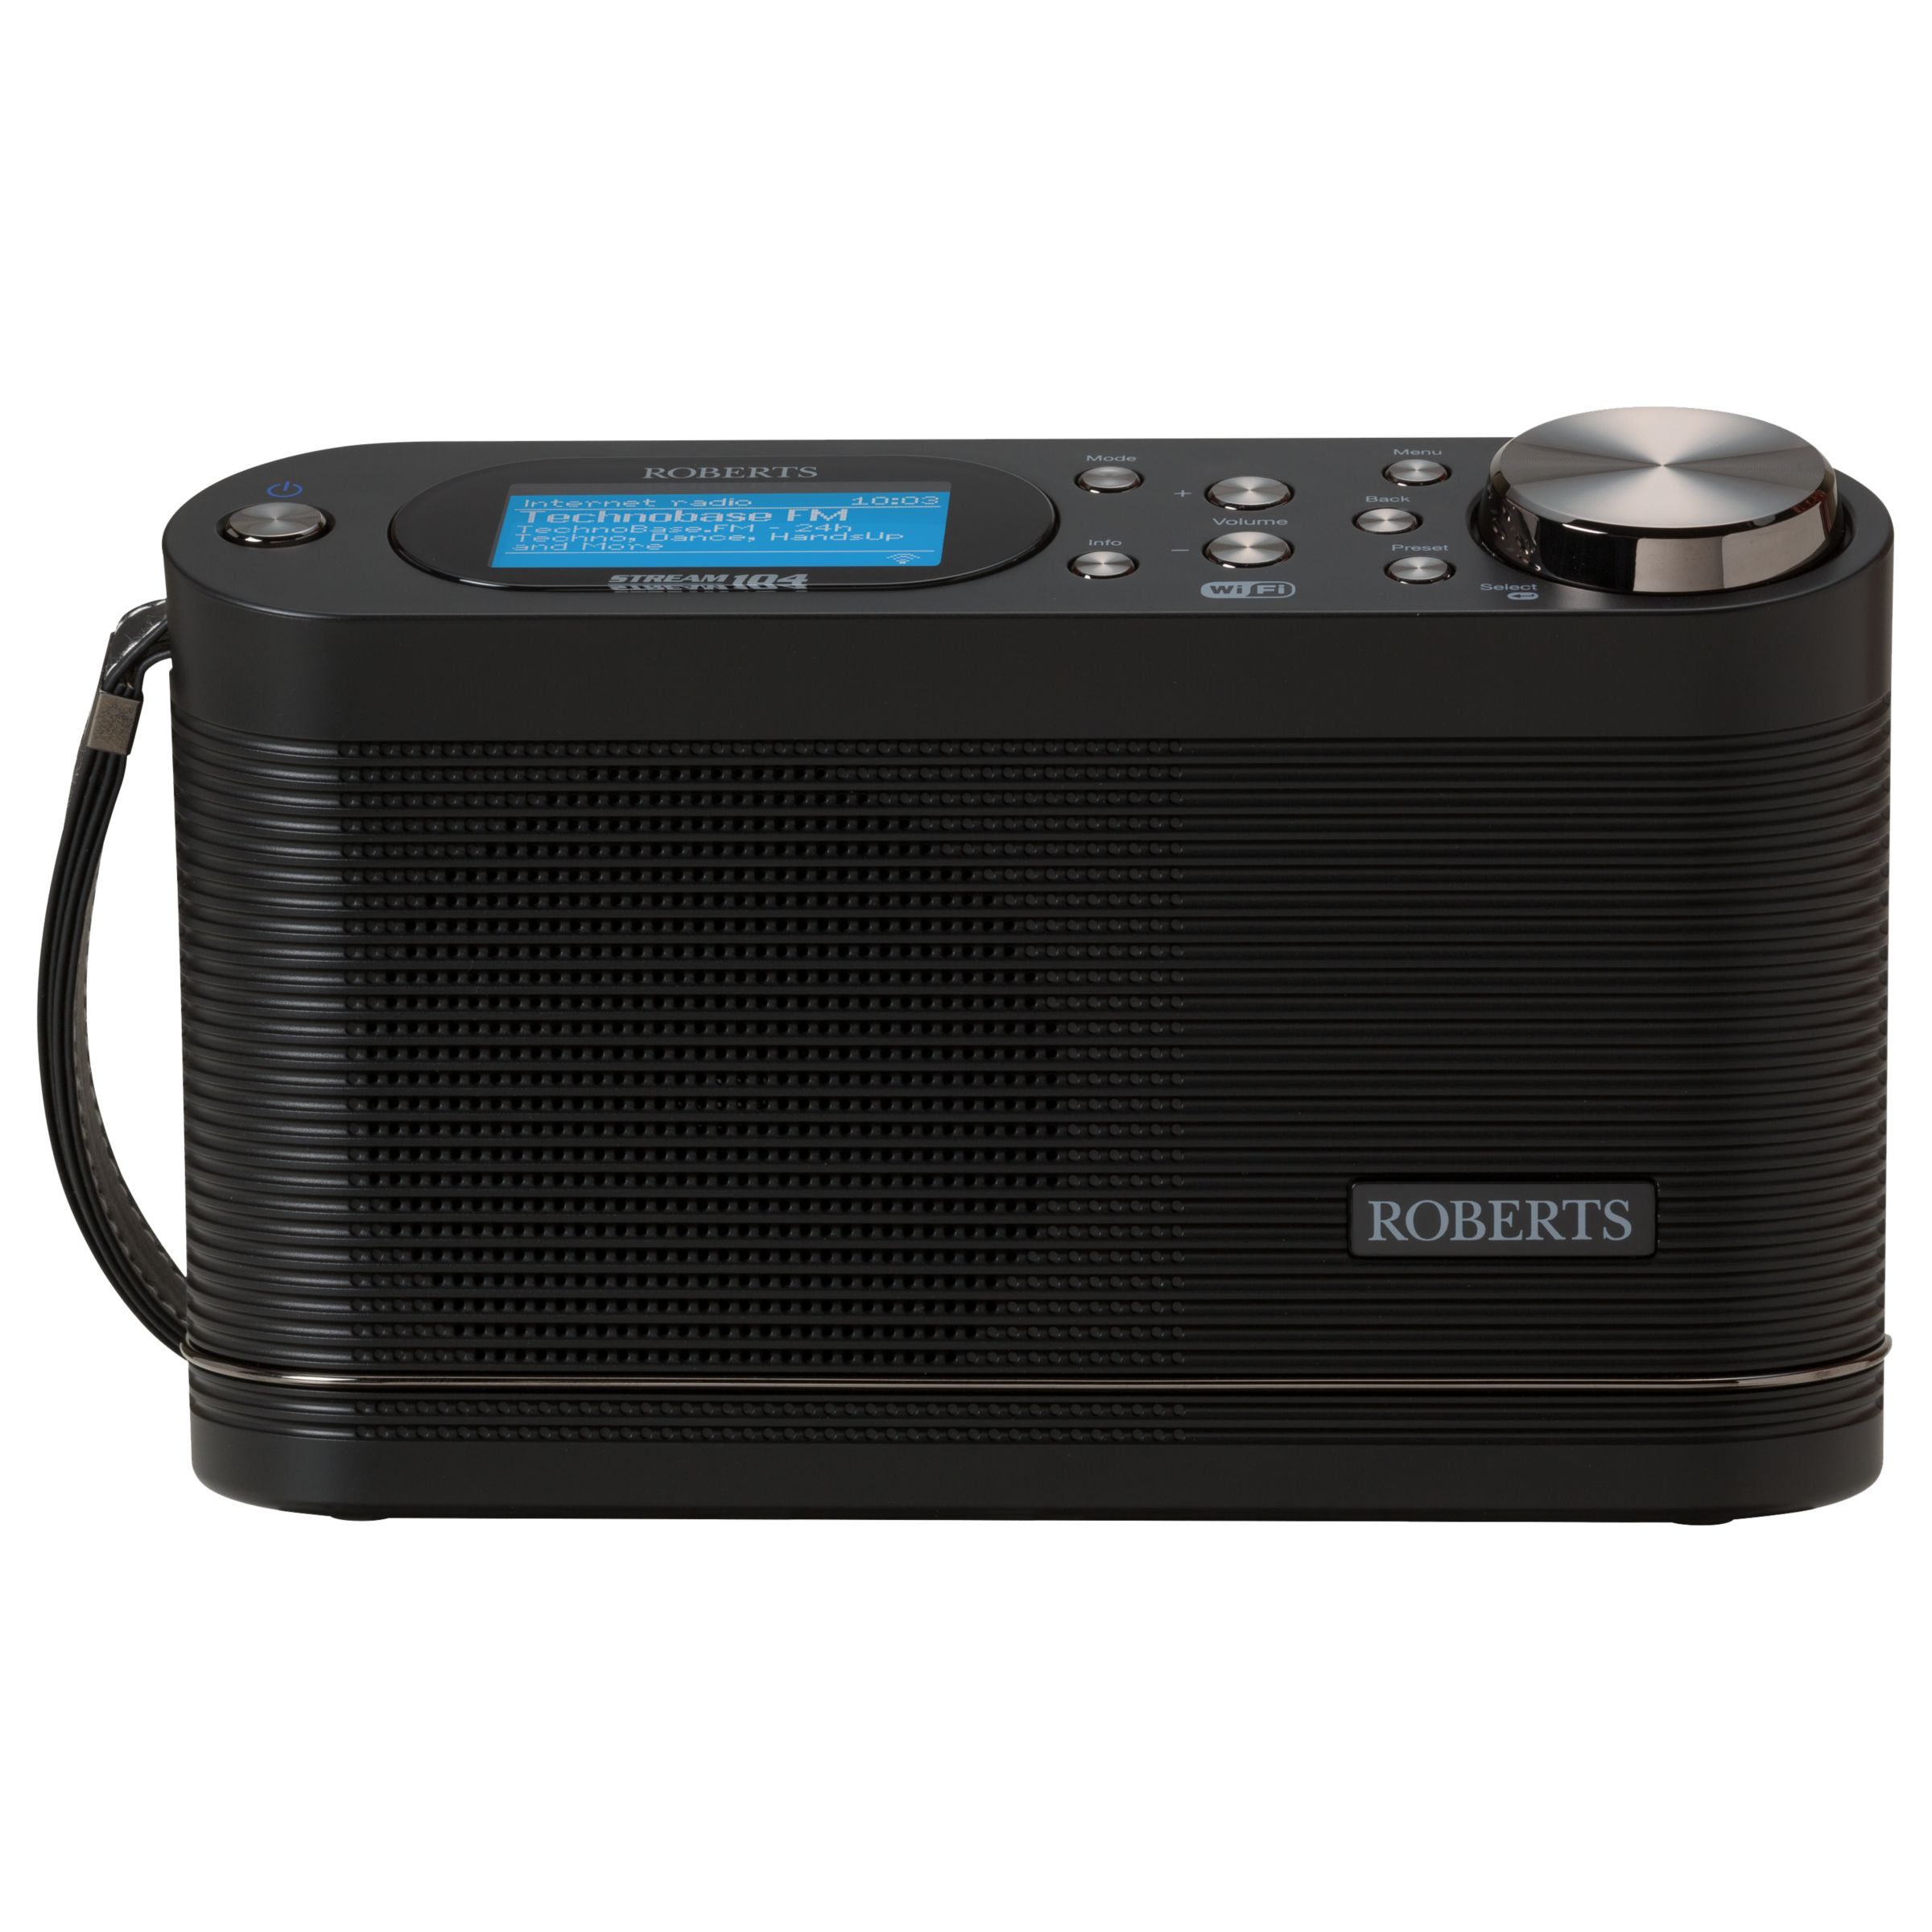 Roberts ROBERTS Stream 104 Smart Radio With DAB+/FM/Internet Radio